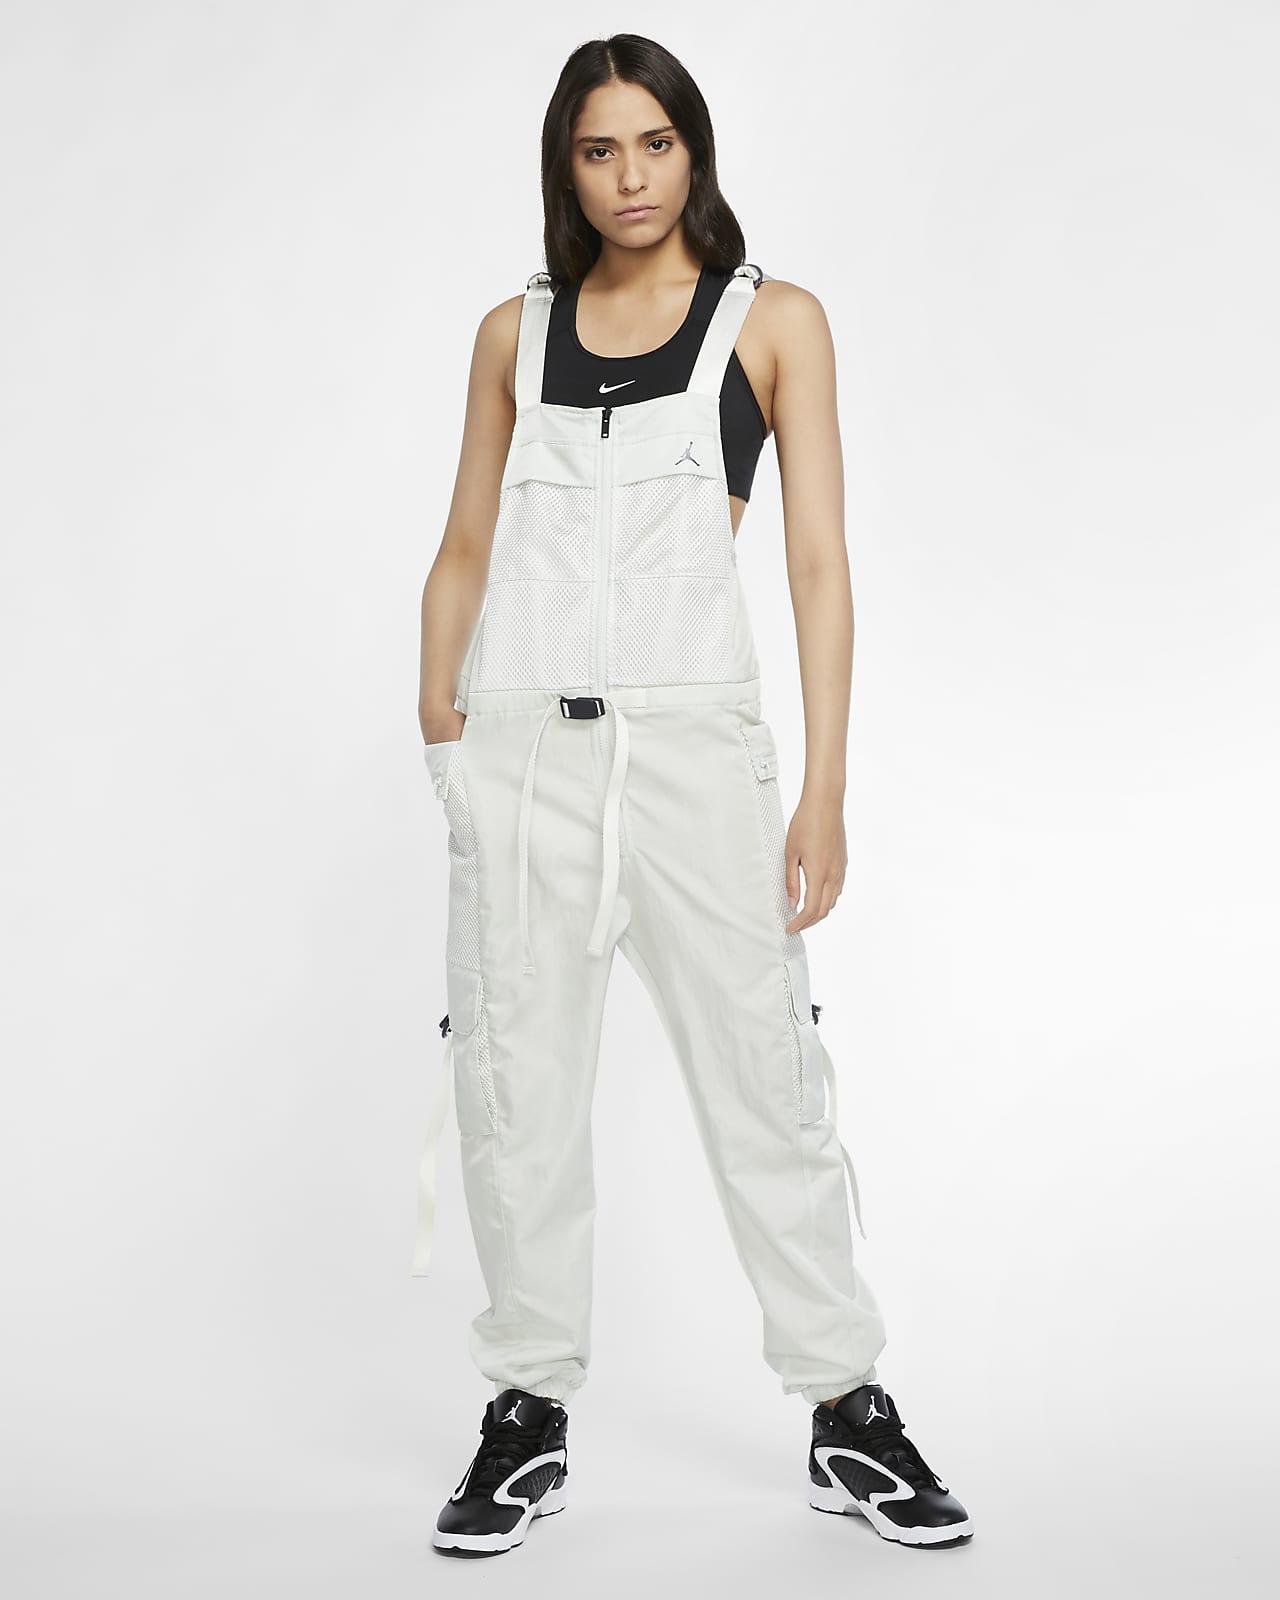 Jordan Utility Damen-Flight-Suit